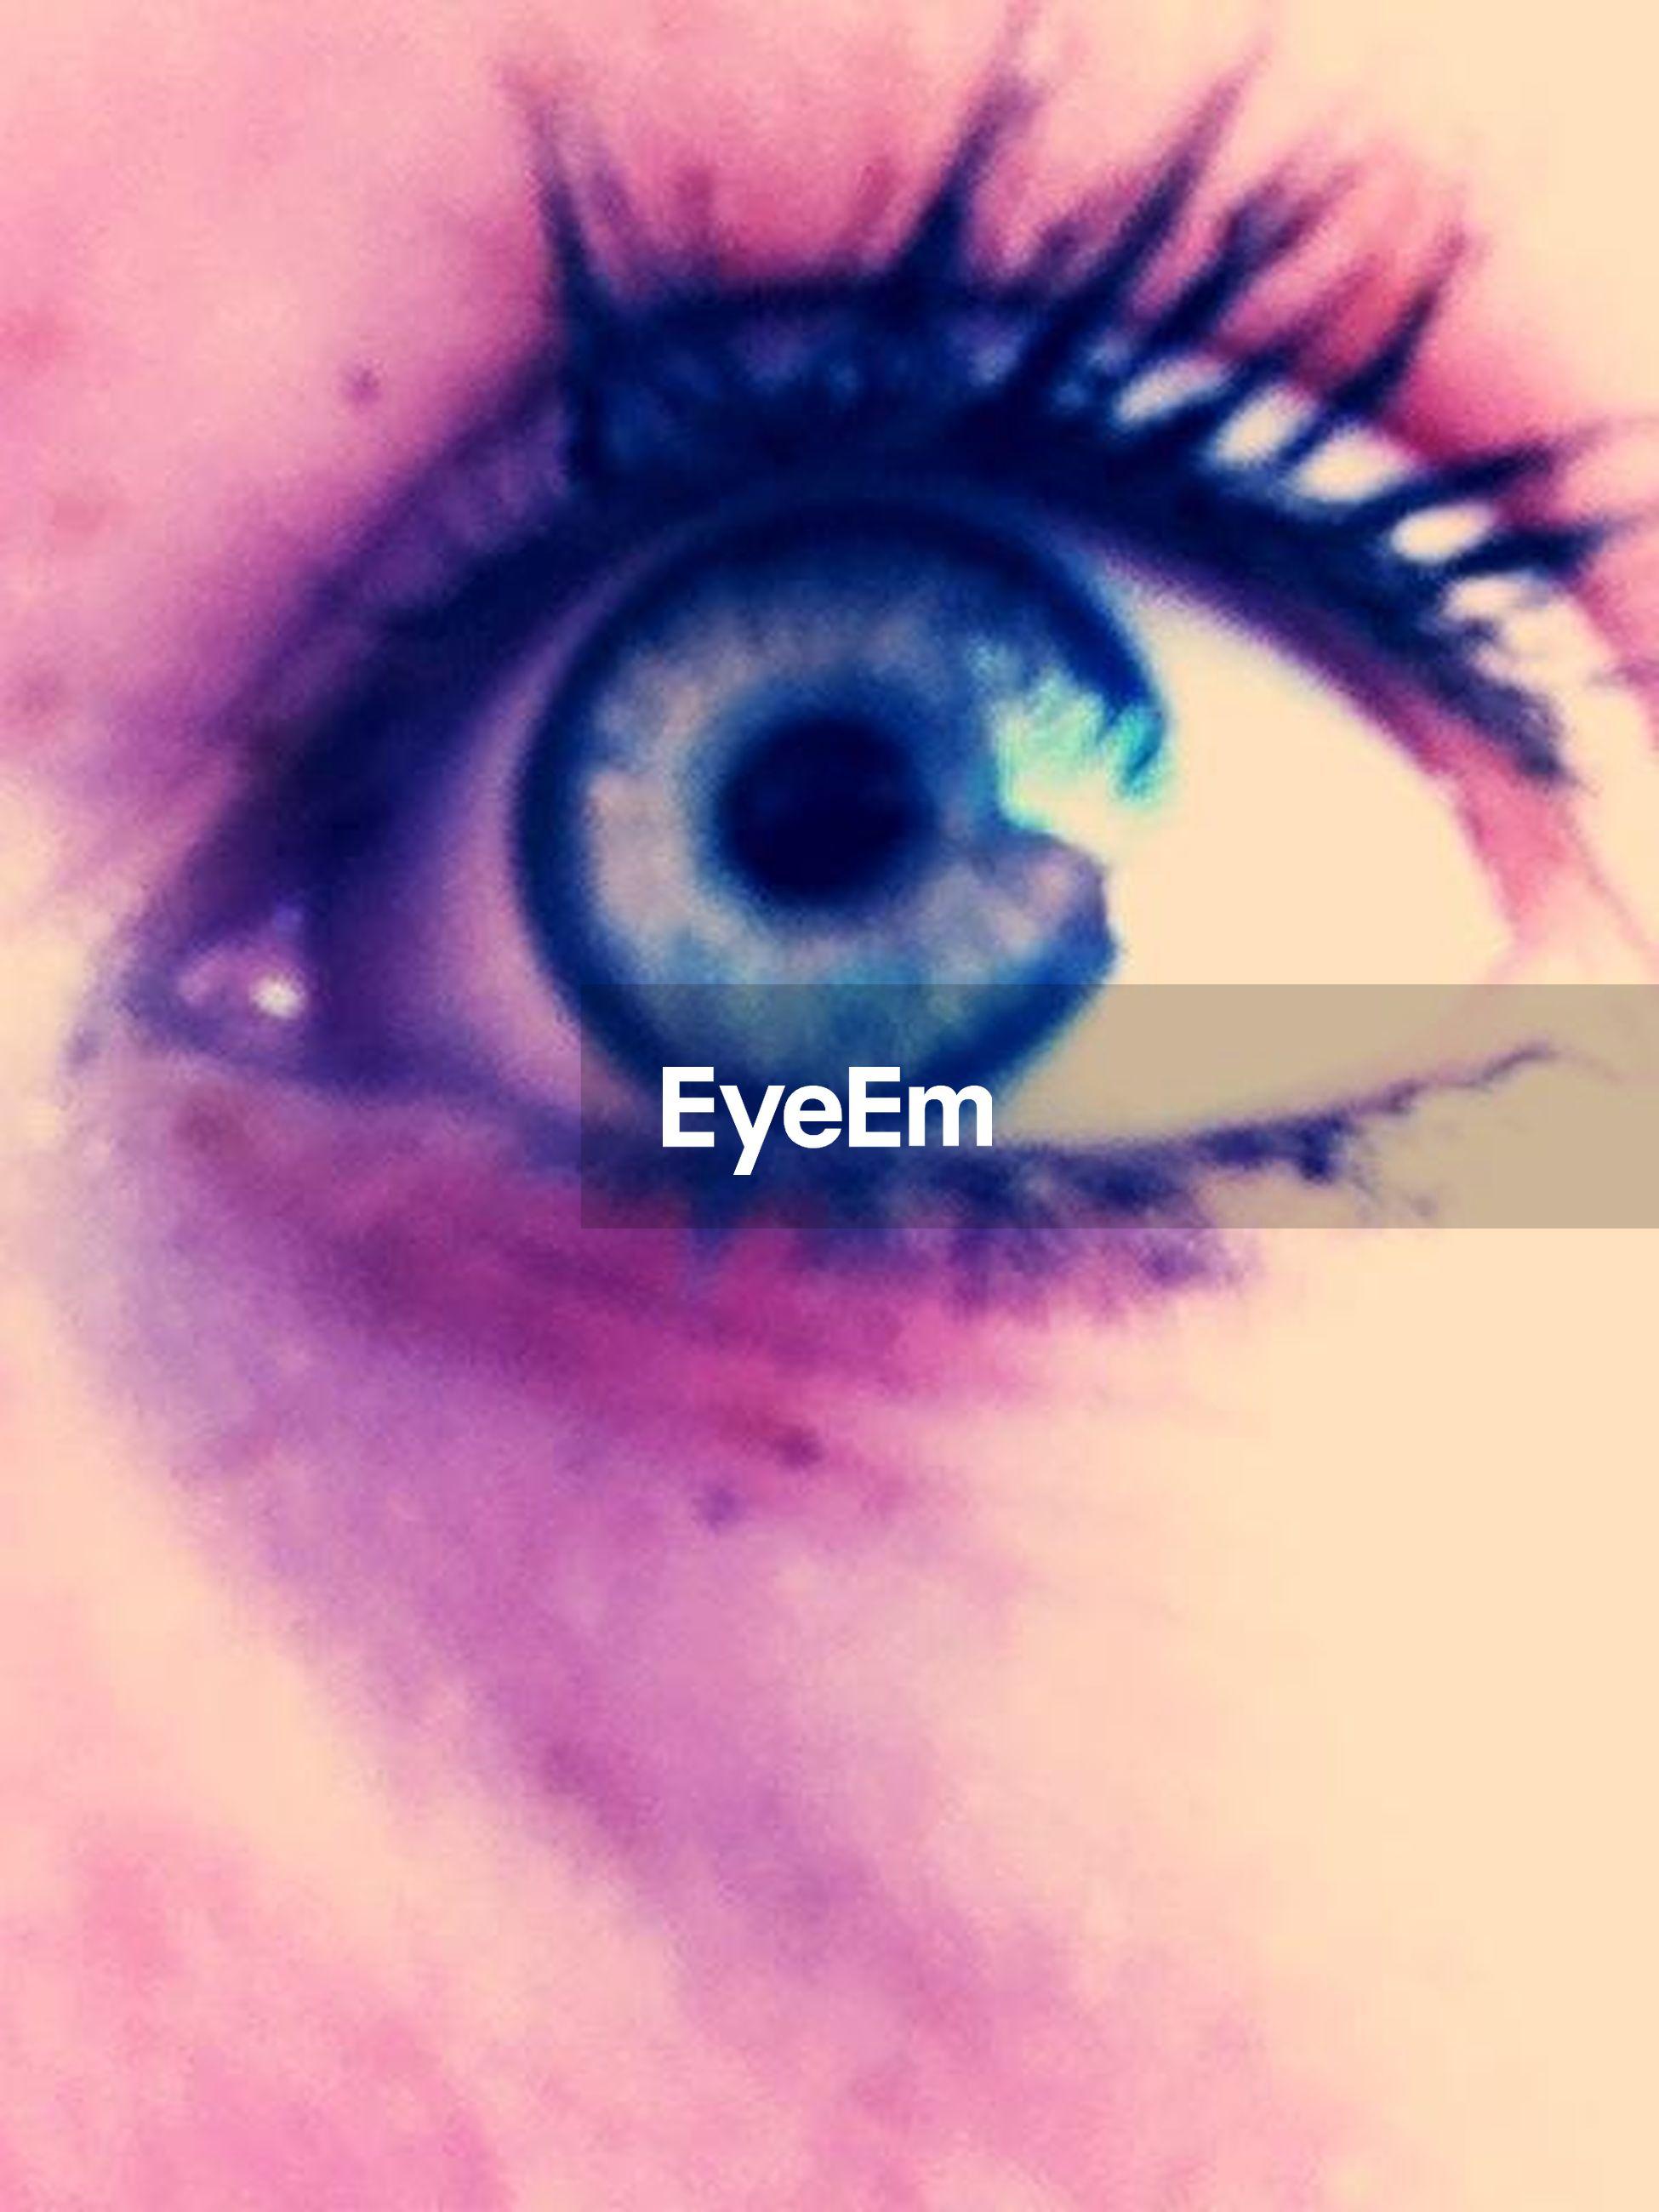 human eye, close-up, eyelash, eyesight, part of, looking at camera, portrait, extreme close-up, sensory perception, iris - eye, unrecognizable person, eyeball, indoors, human skin, human face, extreme close up, cropped